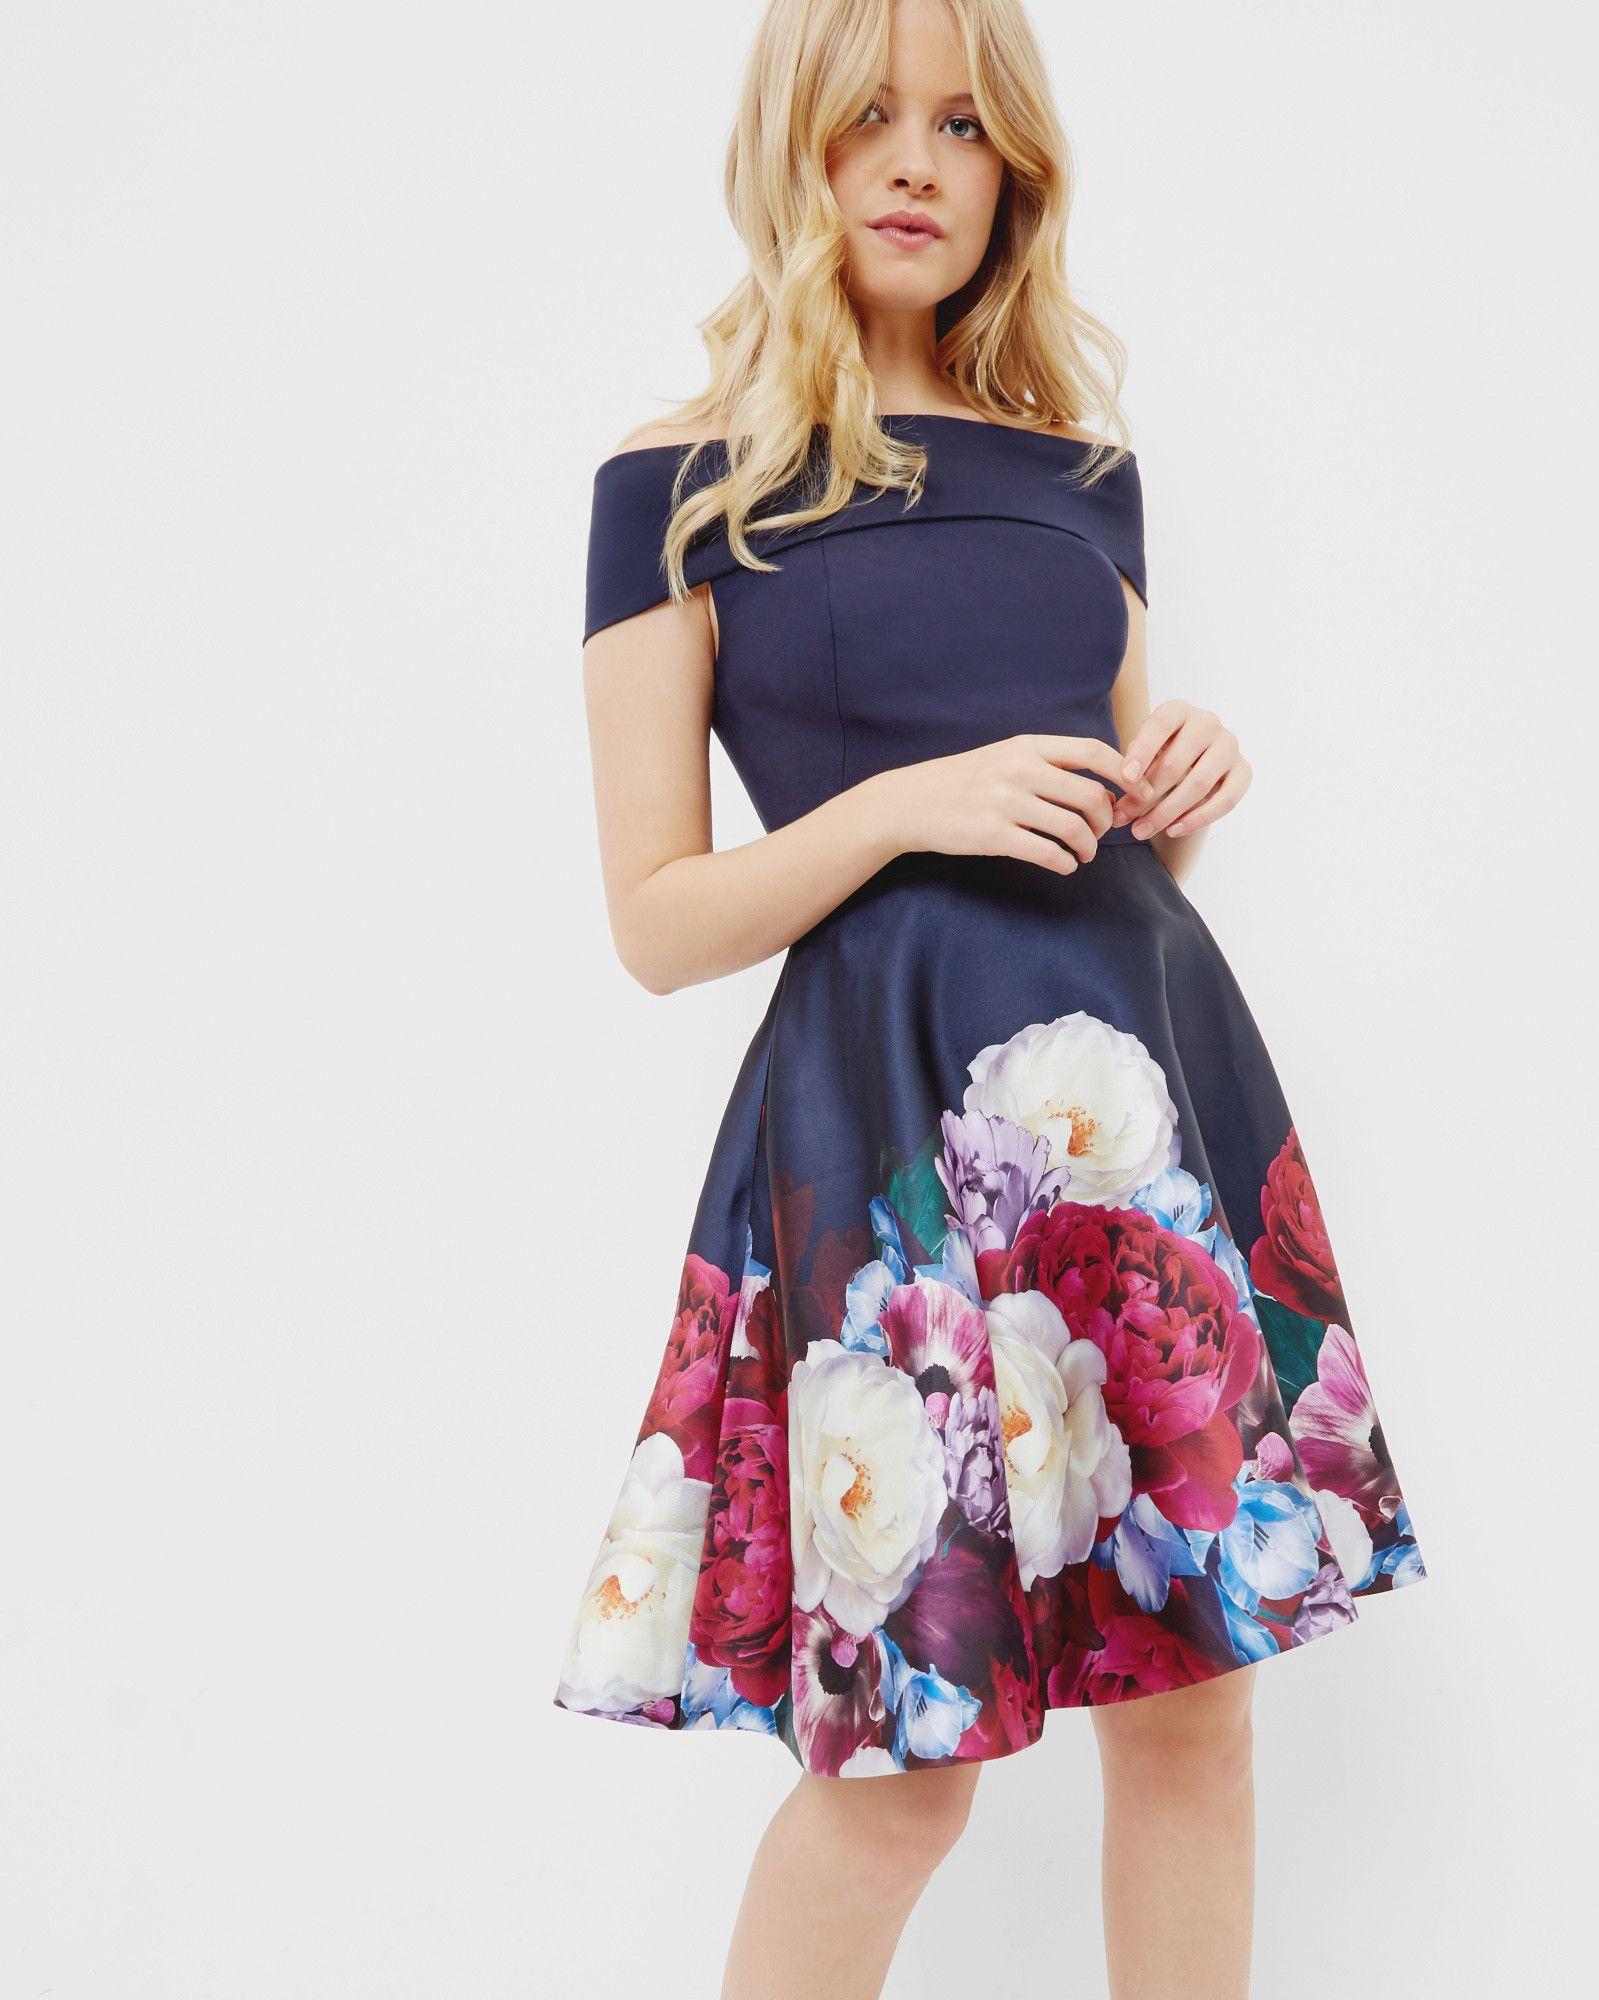 Bardot-Kleid mit Blushing Bouquet-Print - Marineblau | Kleider | Ted ...